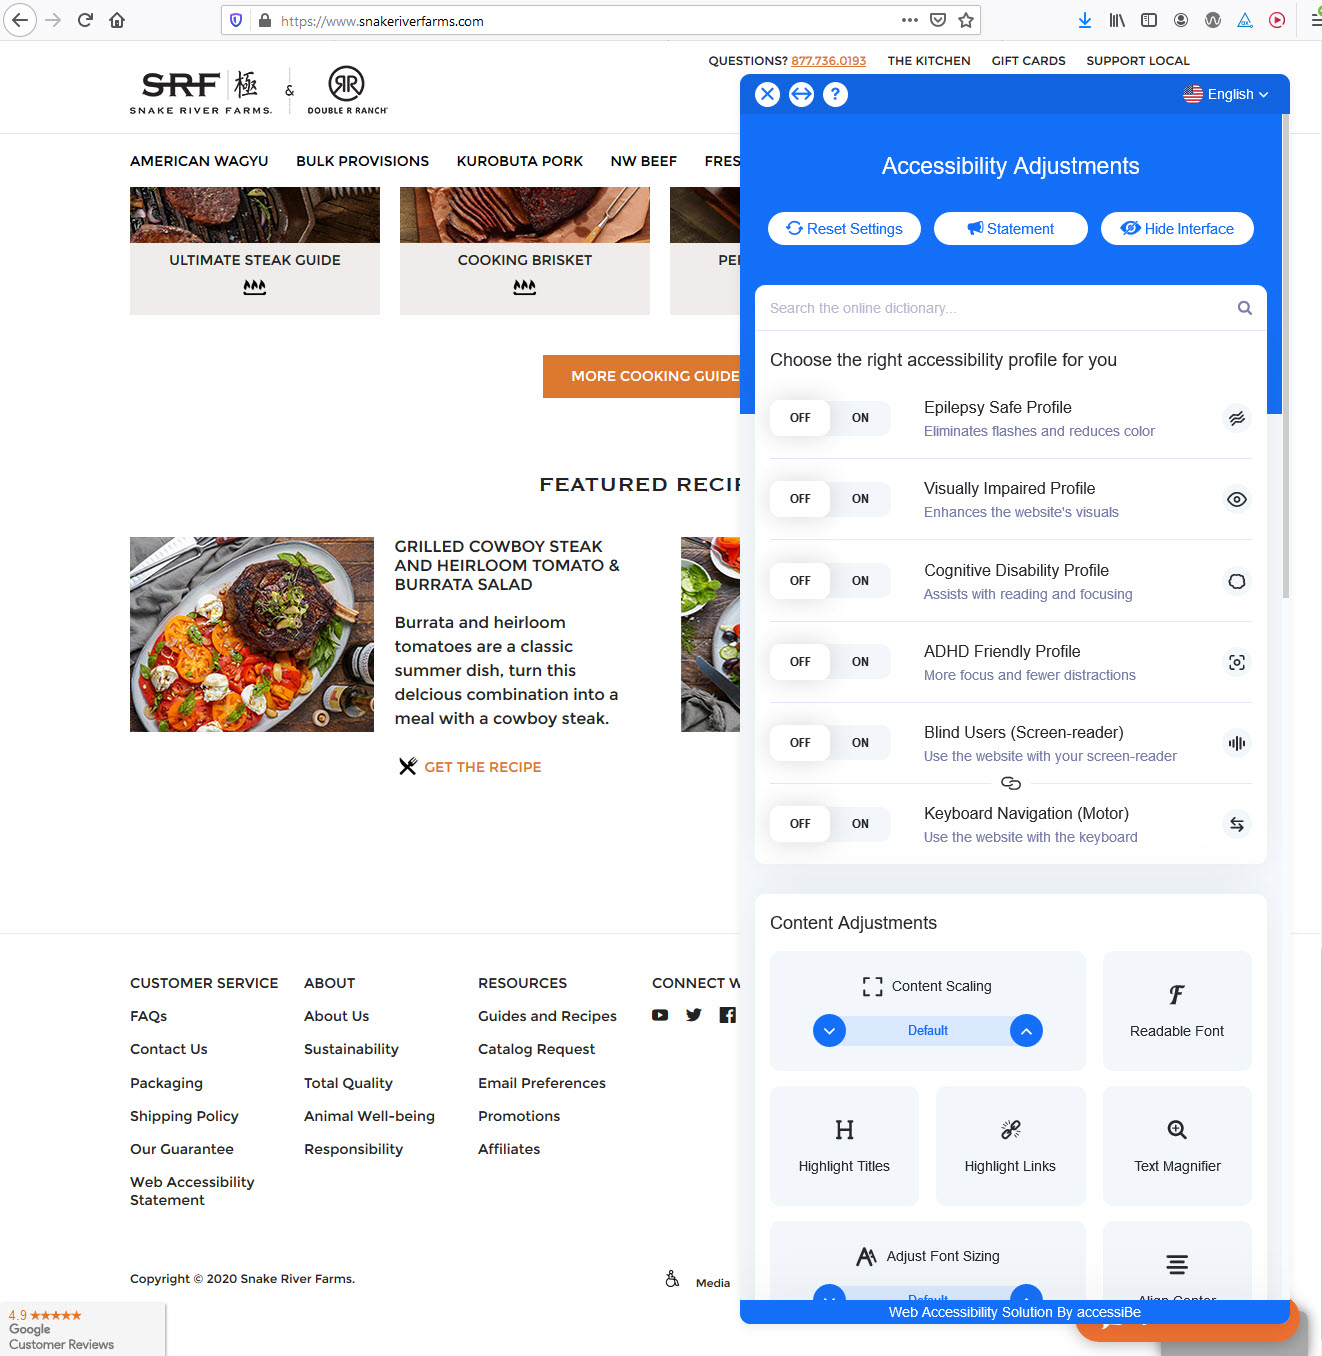 SnakeRiverFarms.com homepage with AccessiBe toolbar menu open